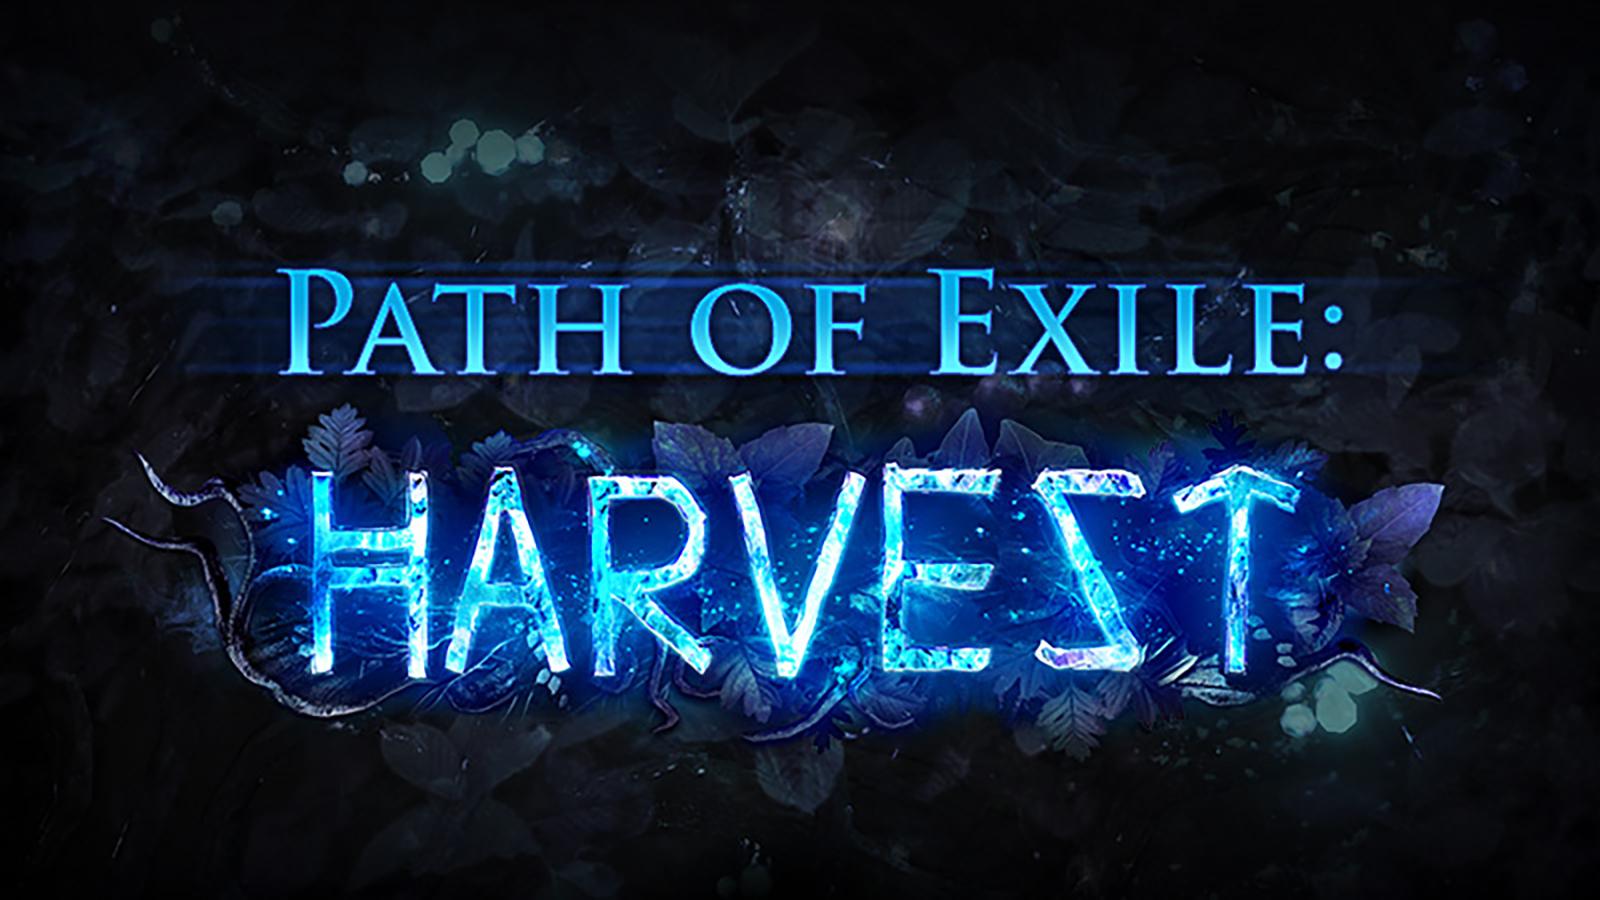 Harvest Powerleveling 1-70 itsjustaloginman - e2p.com